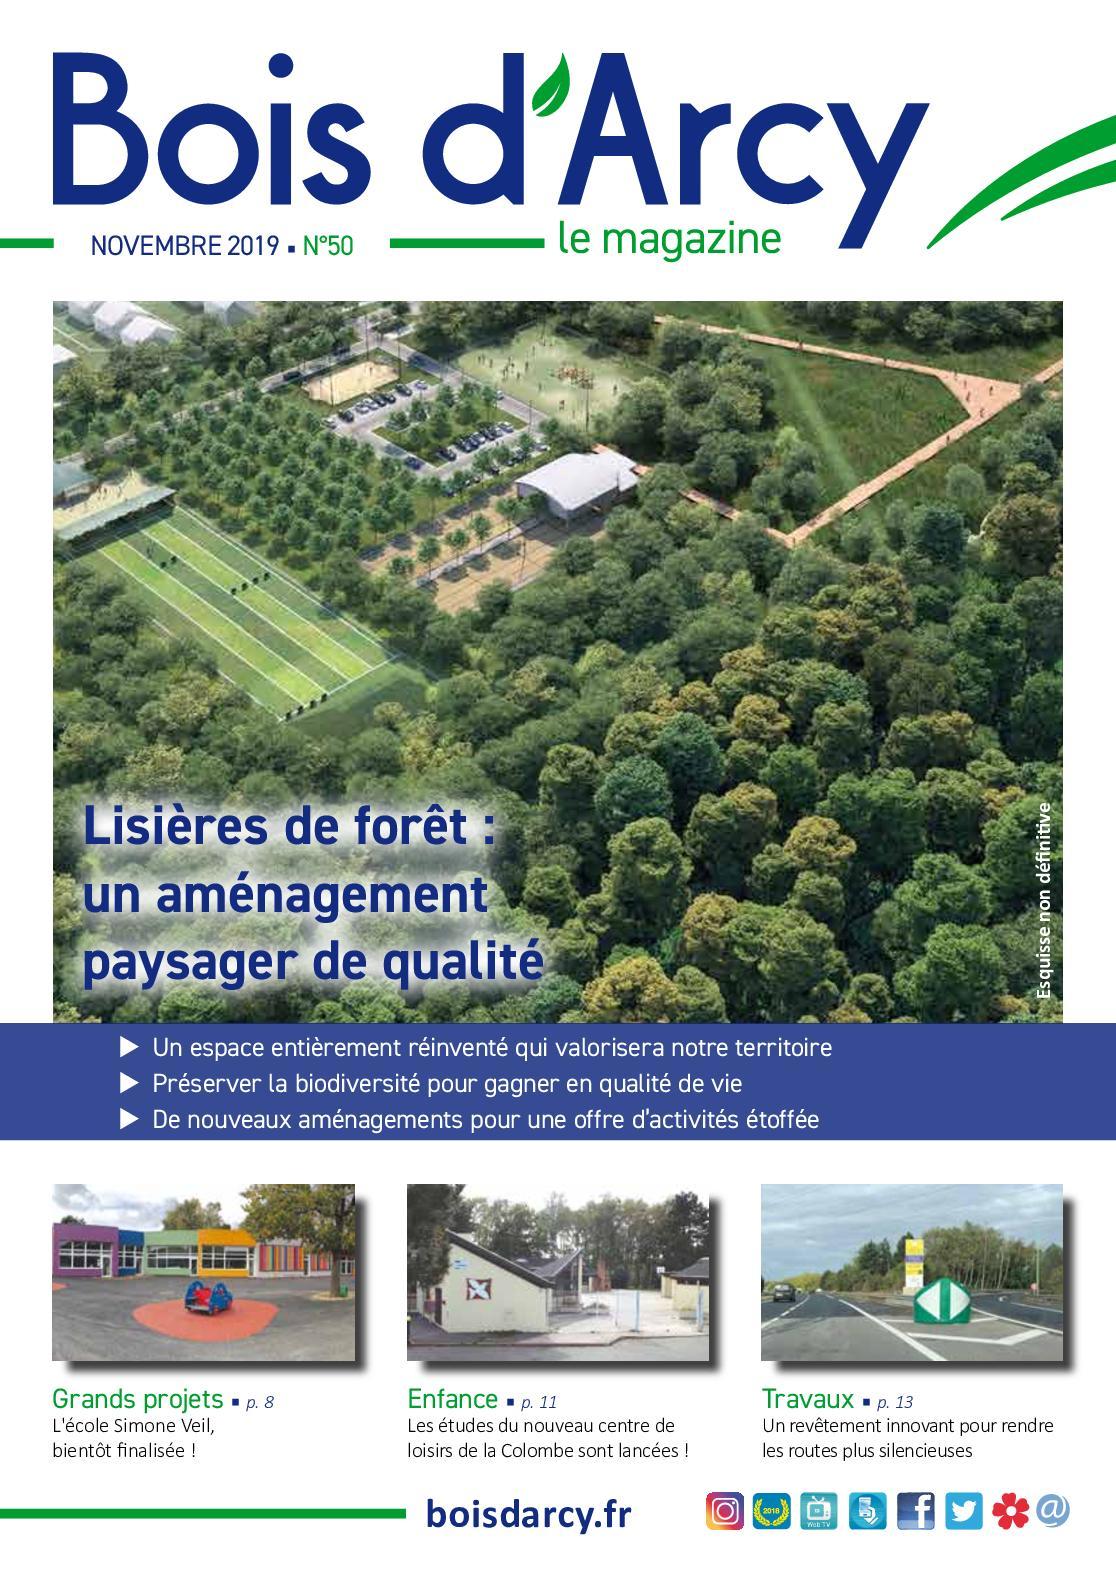 Calaméo Bois Darcy Le Magazine N50 Novembre 2019